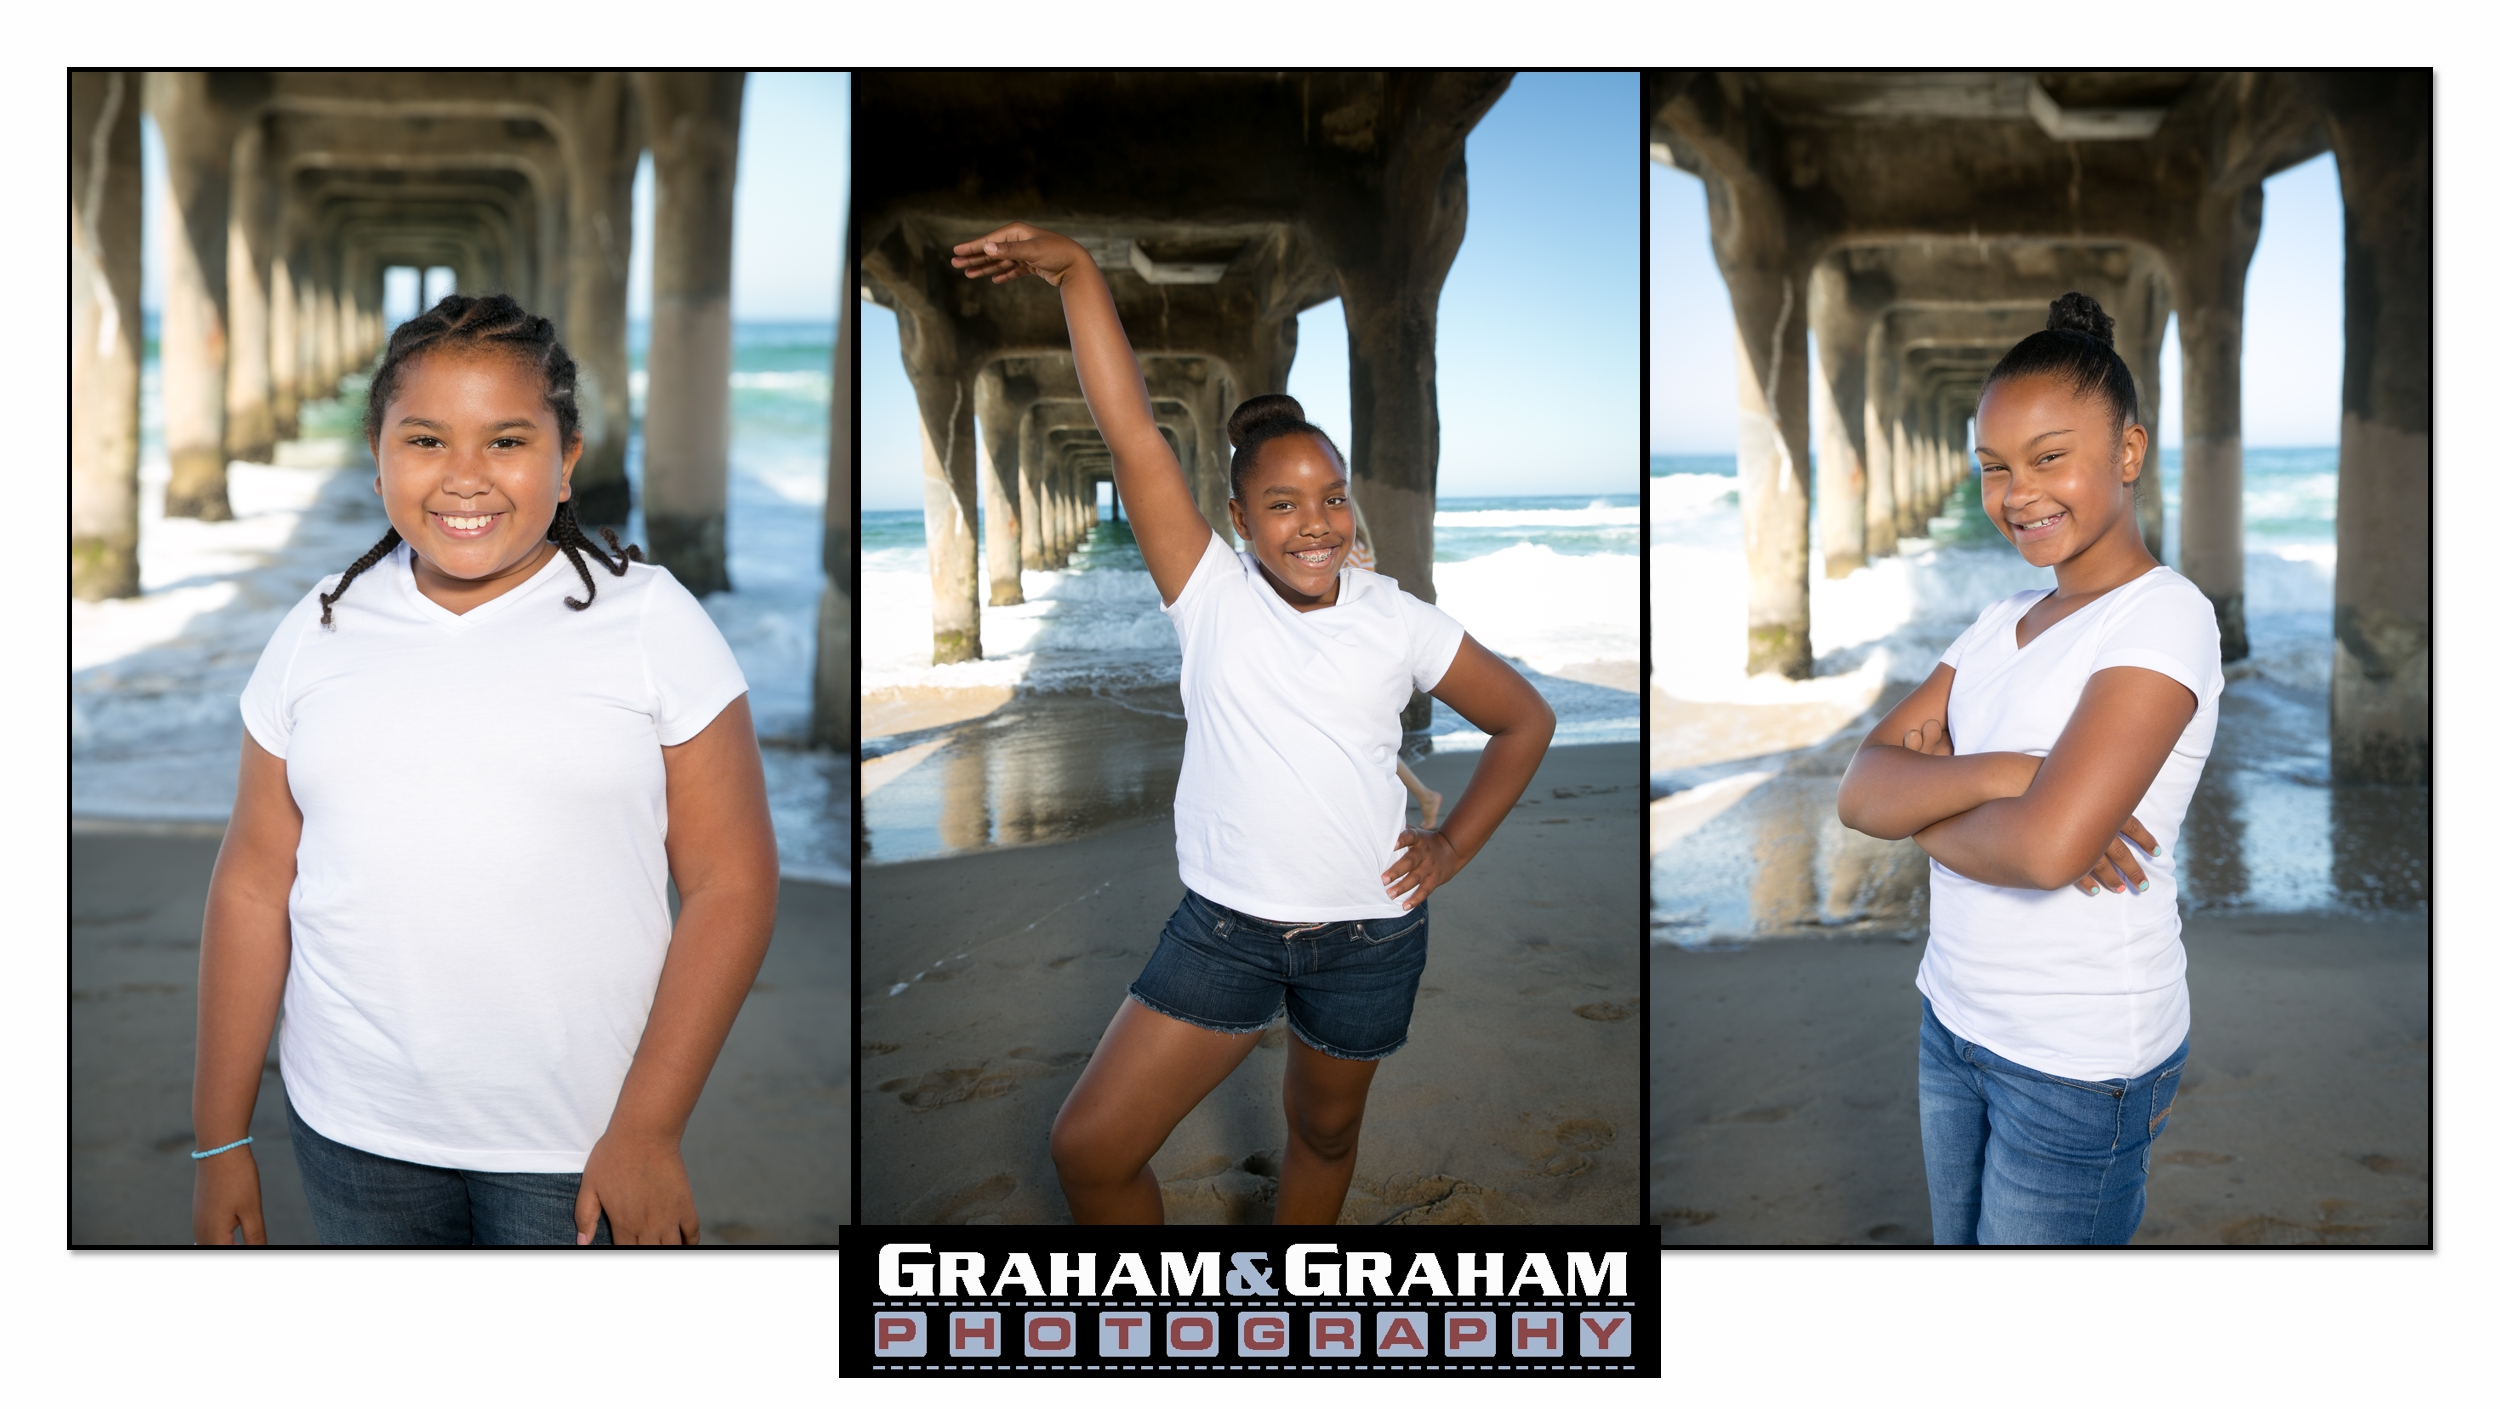 Manhattan Beach Family Photo day